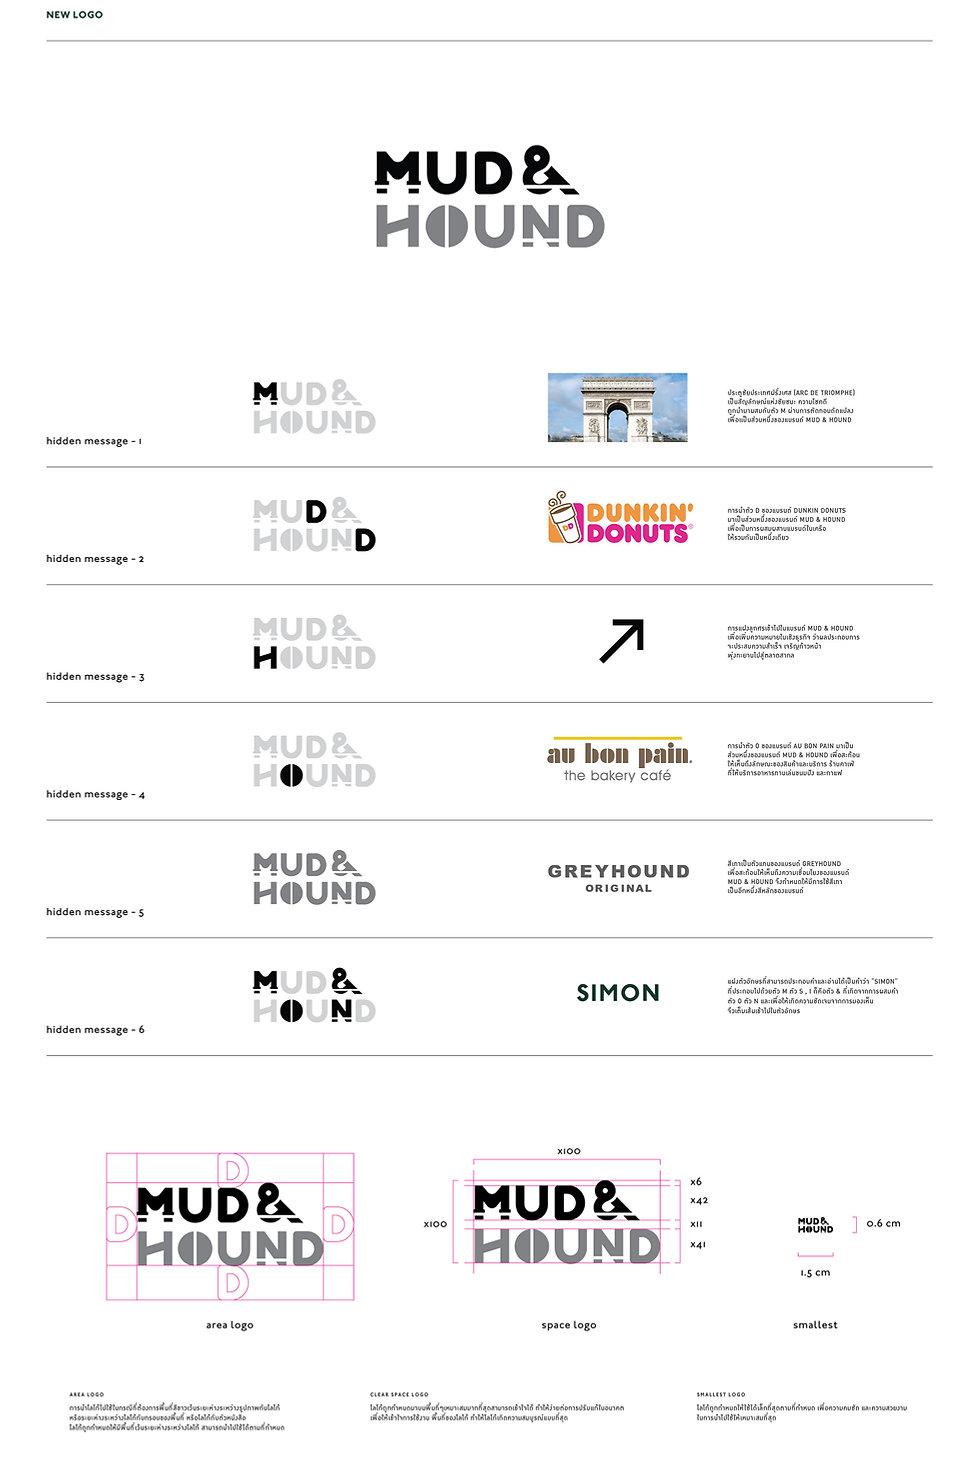 web, be _ mud _ hound - 04.jpg